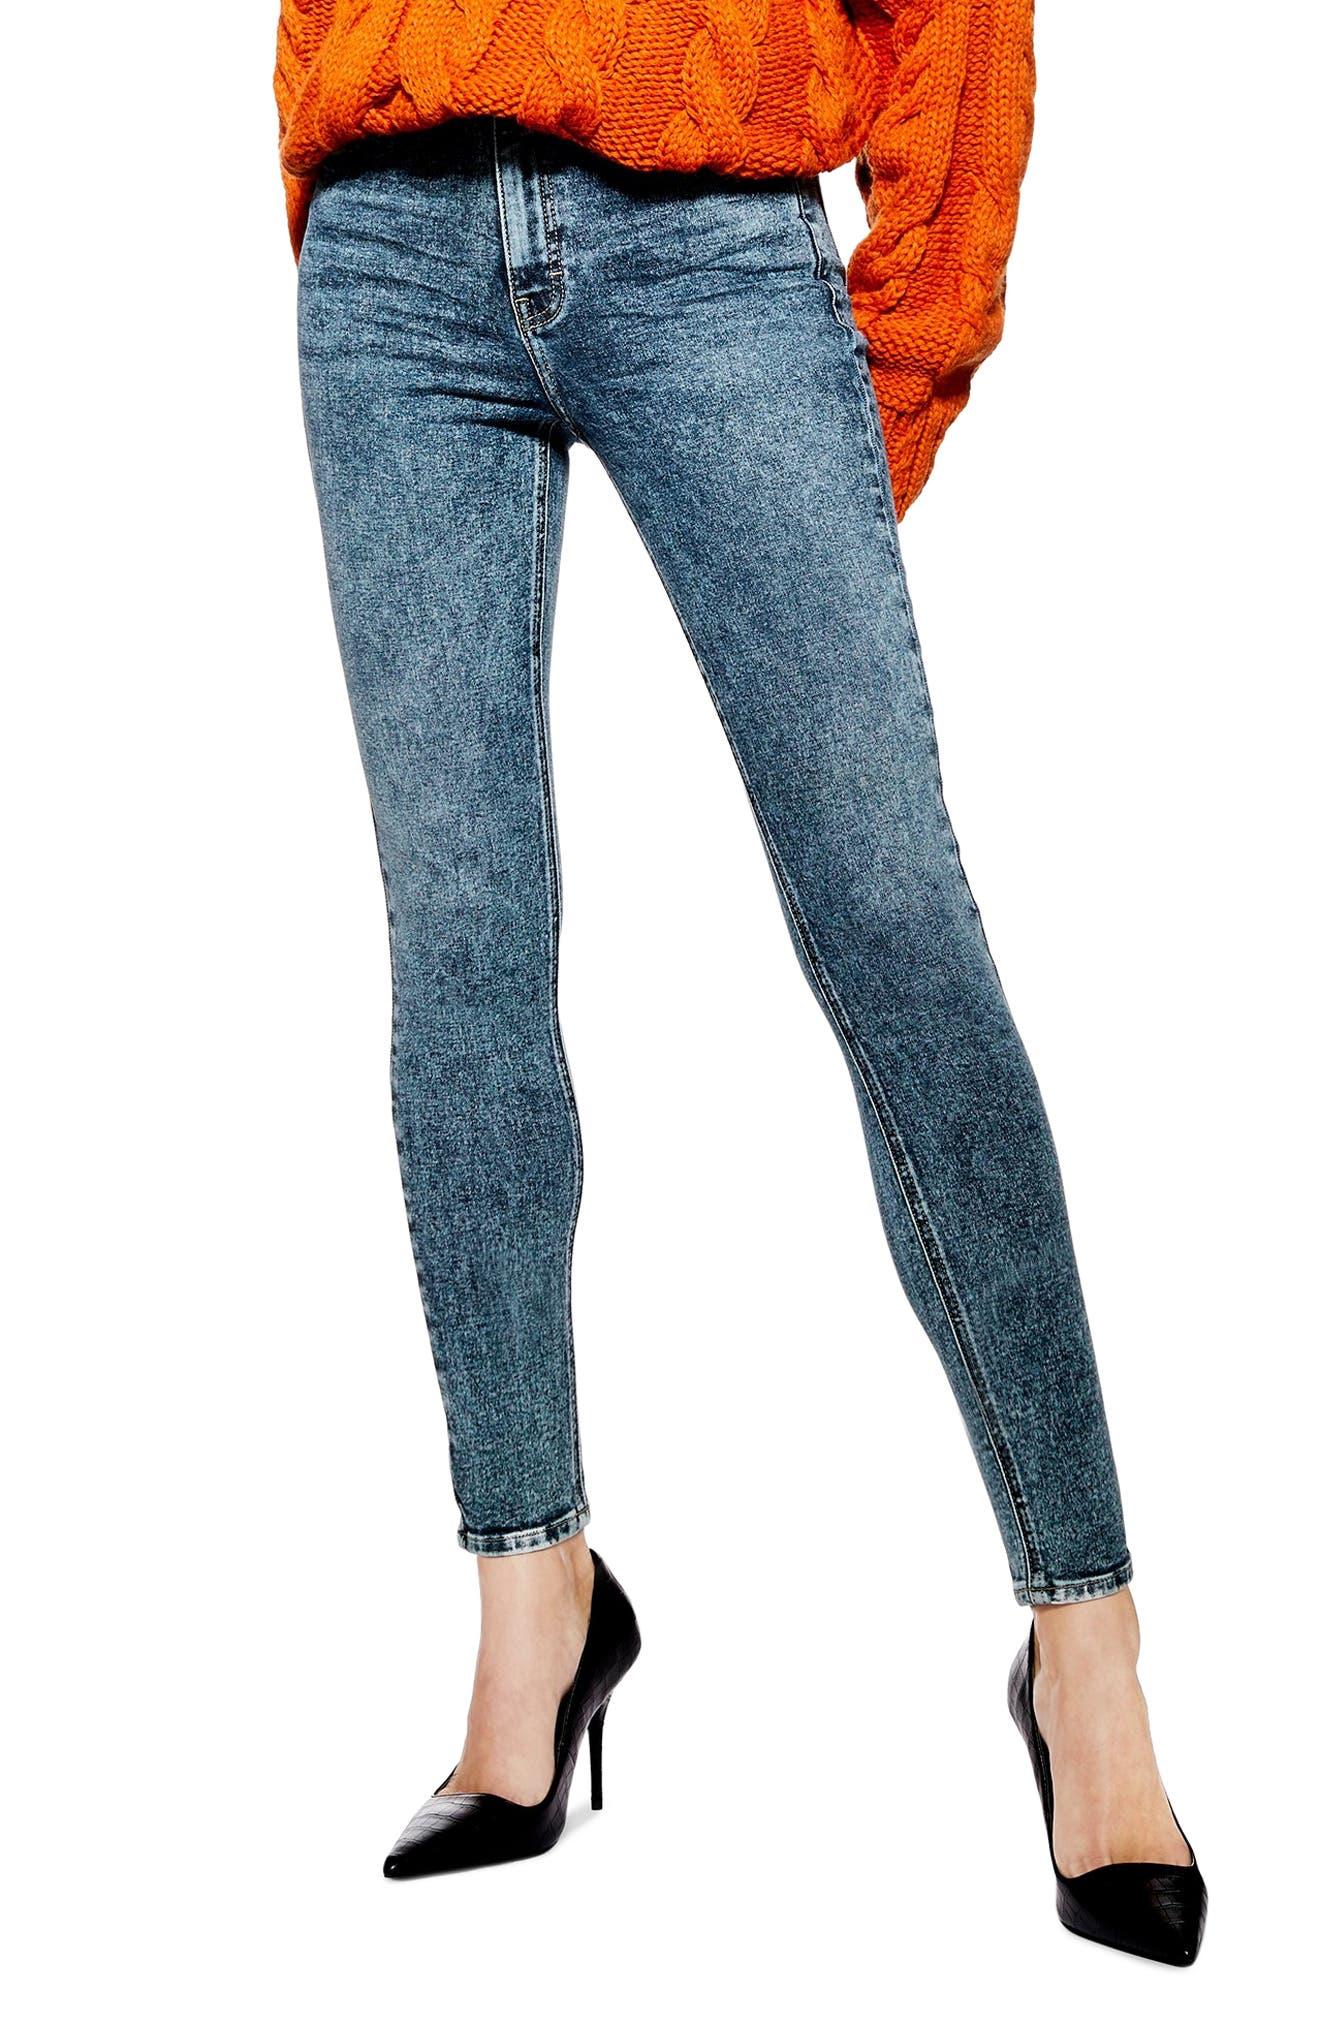 TOPSHOP, Jamie Acid Wash Skinny Jeans, Main thumbnail 1, color, INDIGO